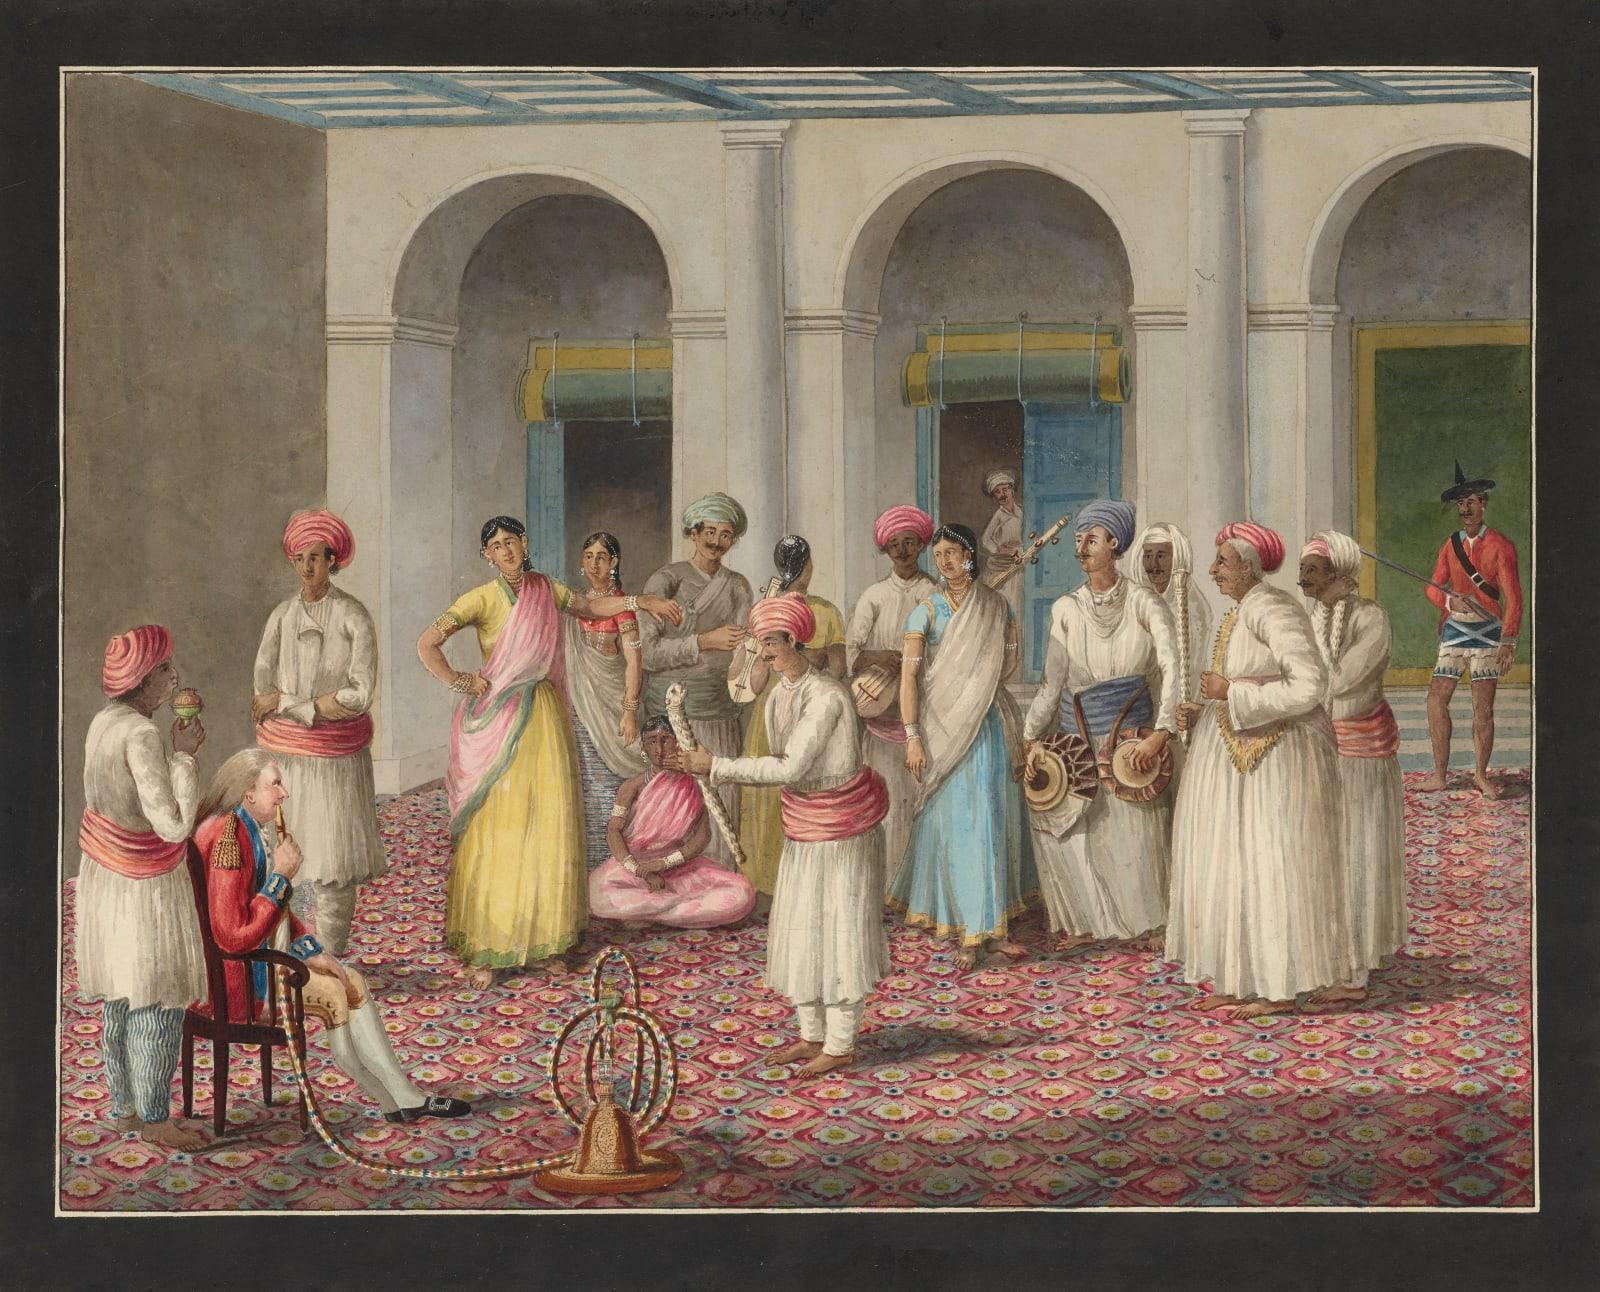 Lucknow Nautch, Murshidabad, 1795-1807